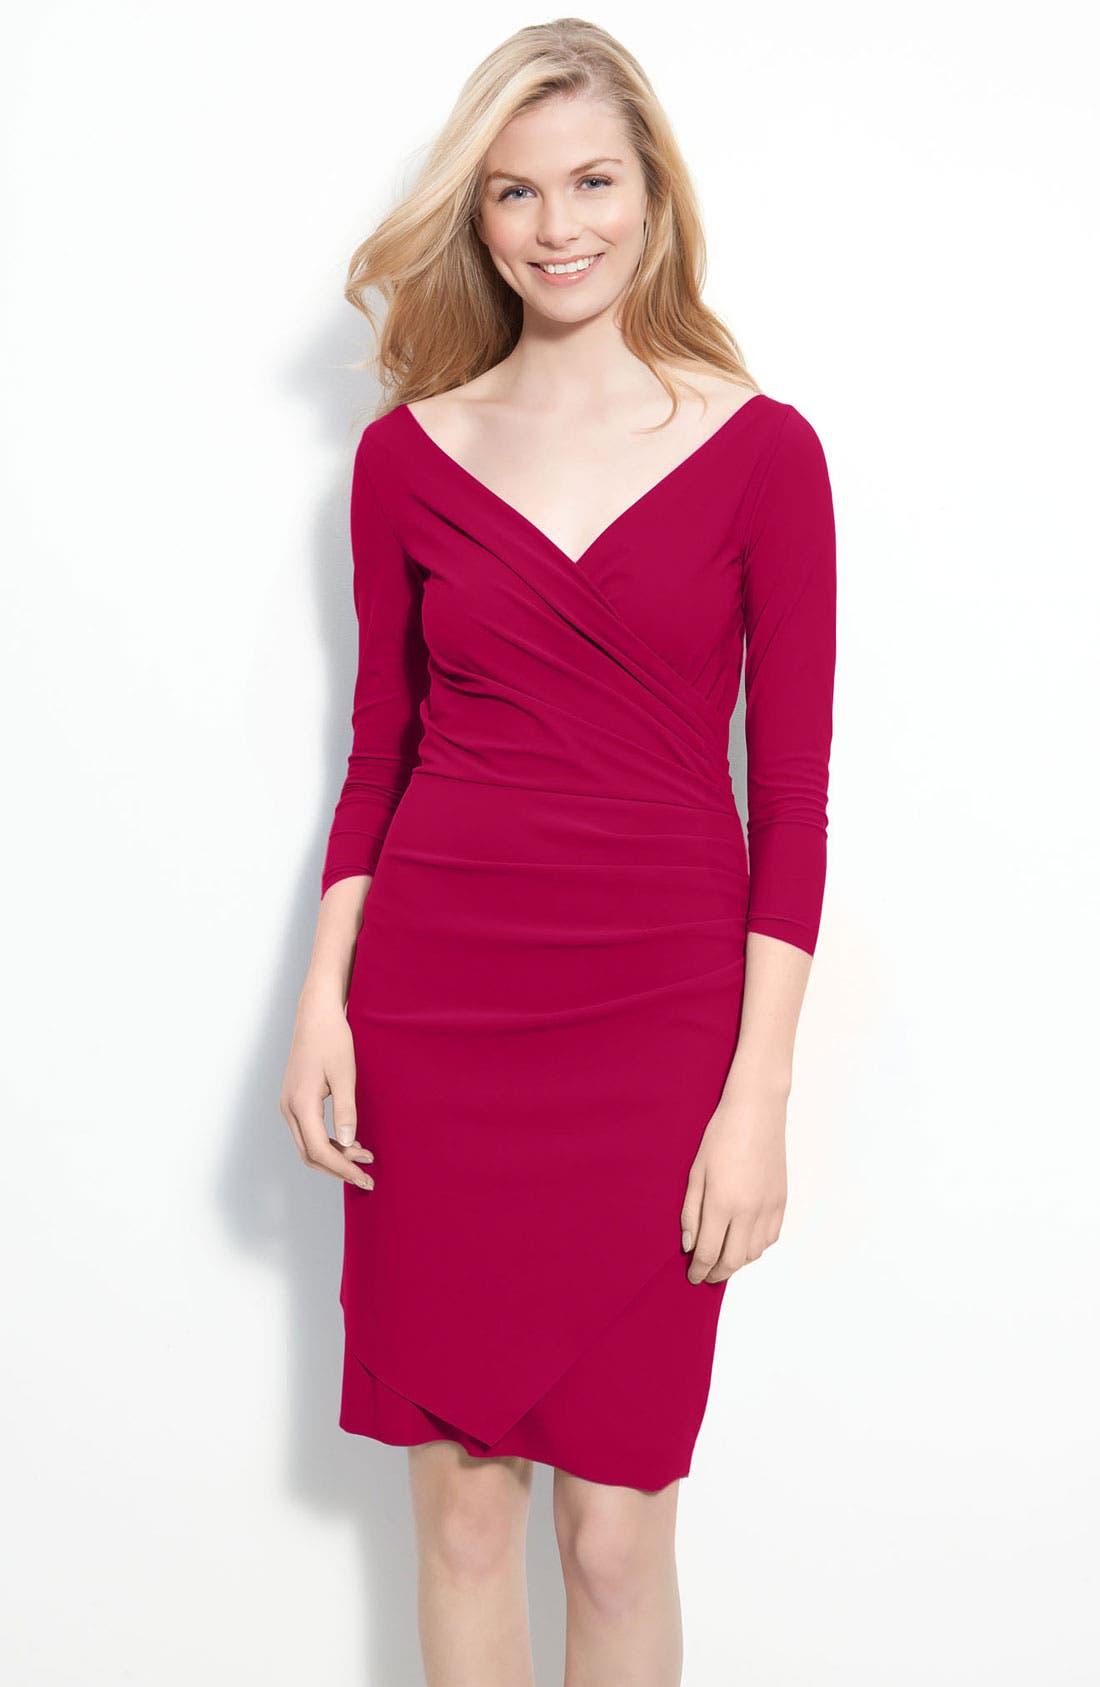 Main Image - La Petite Robe by Chiara Boni 'Calantine' Dress